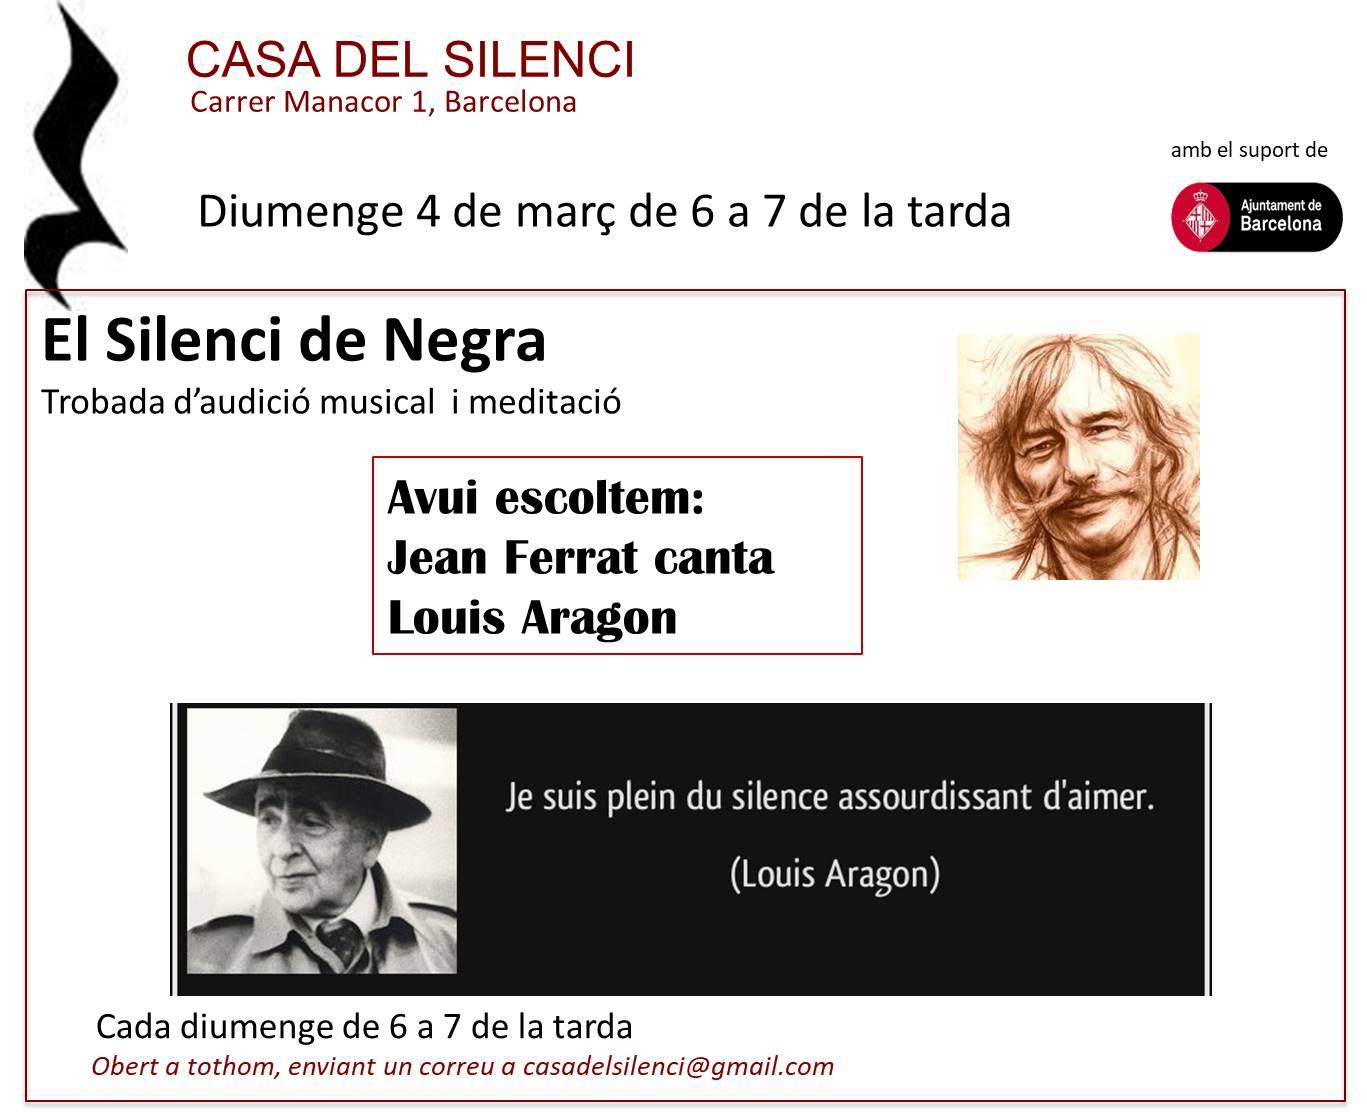 4 de març silenci de negra (imatge)